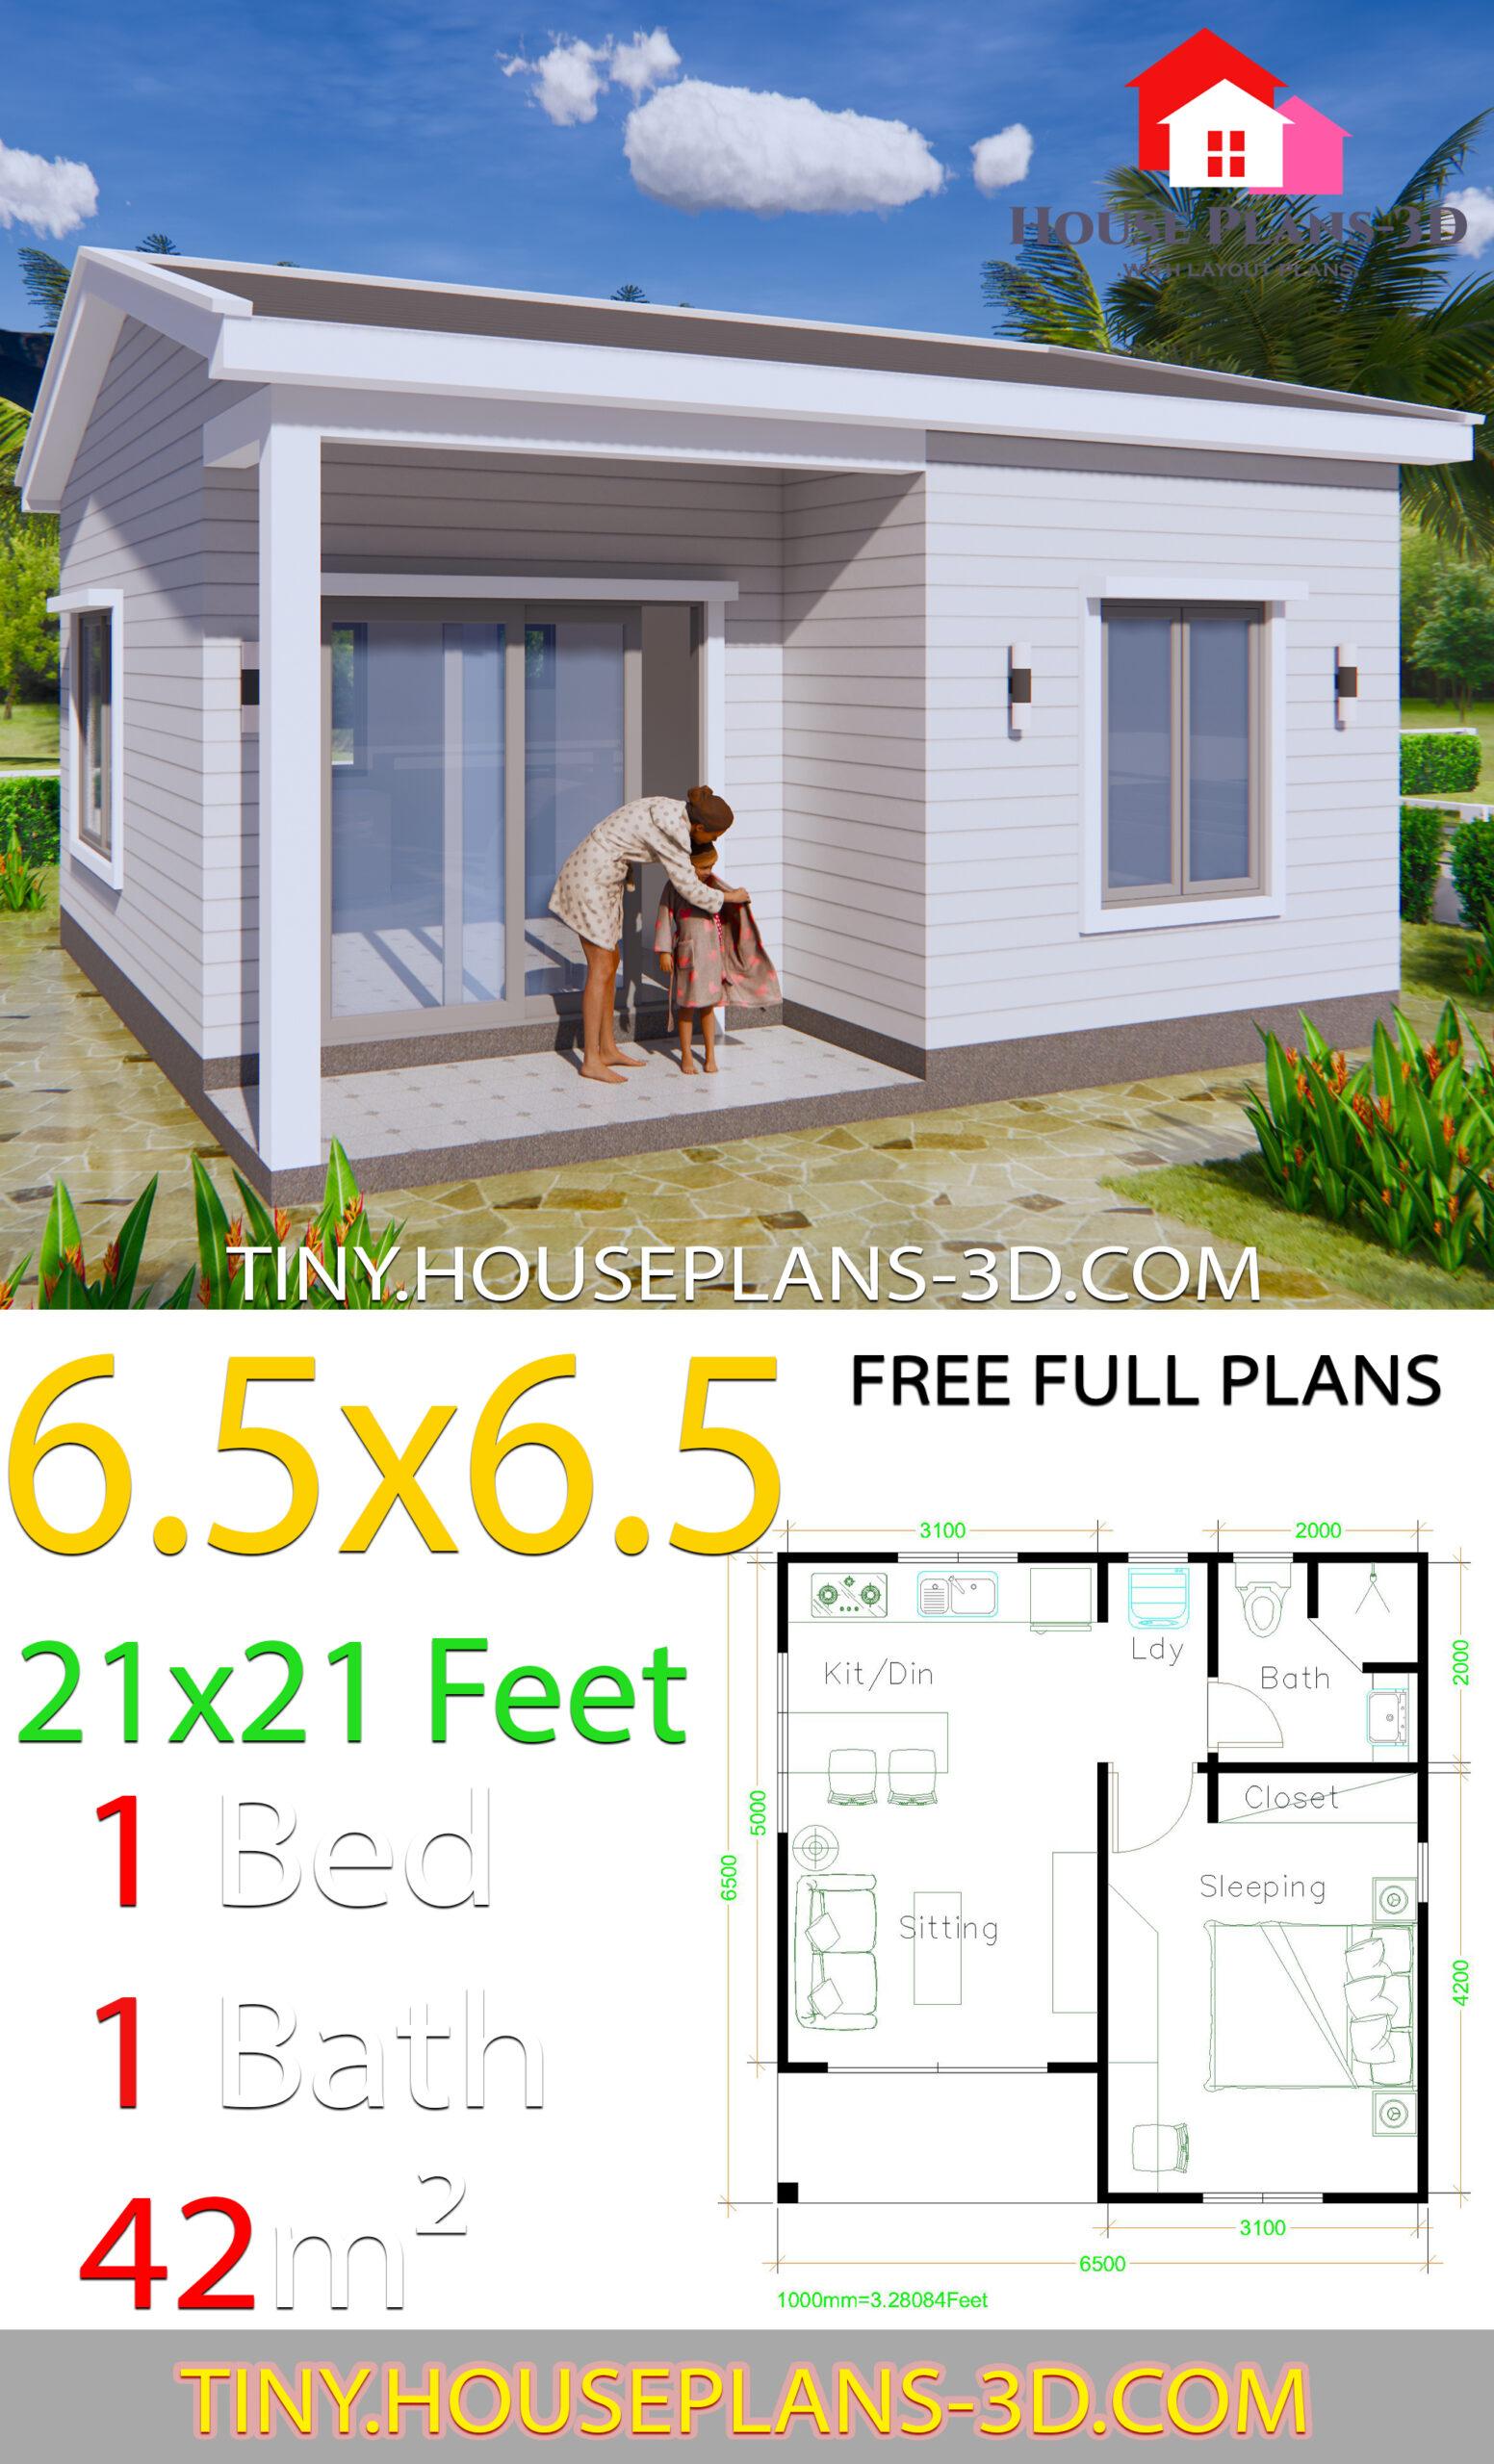 Gable roof Simple House Plans 21x21 Feet 6.5x6.5m